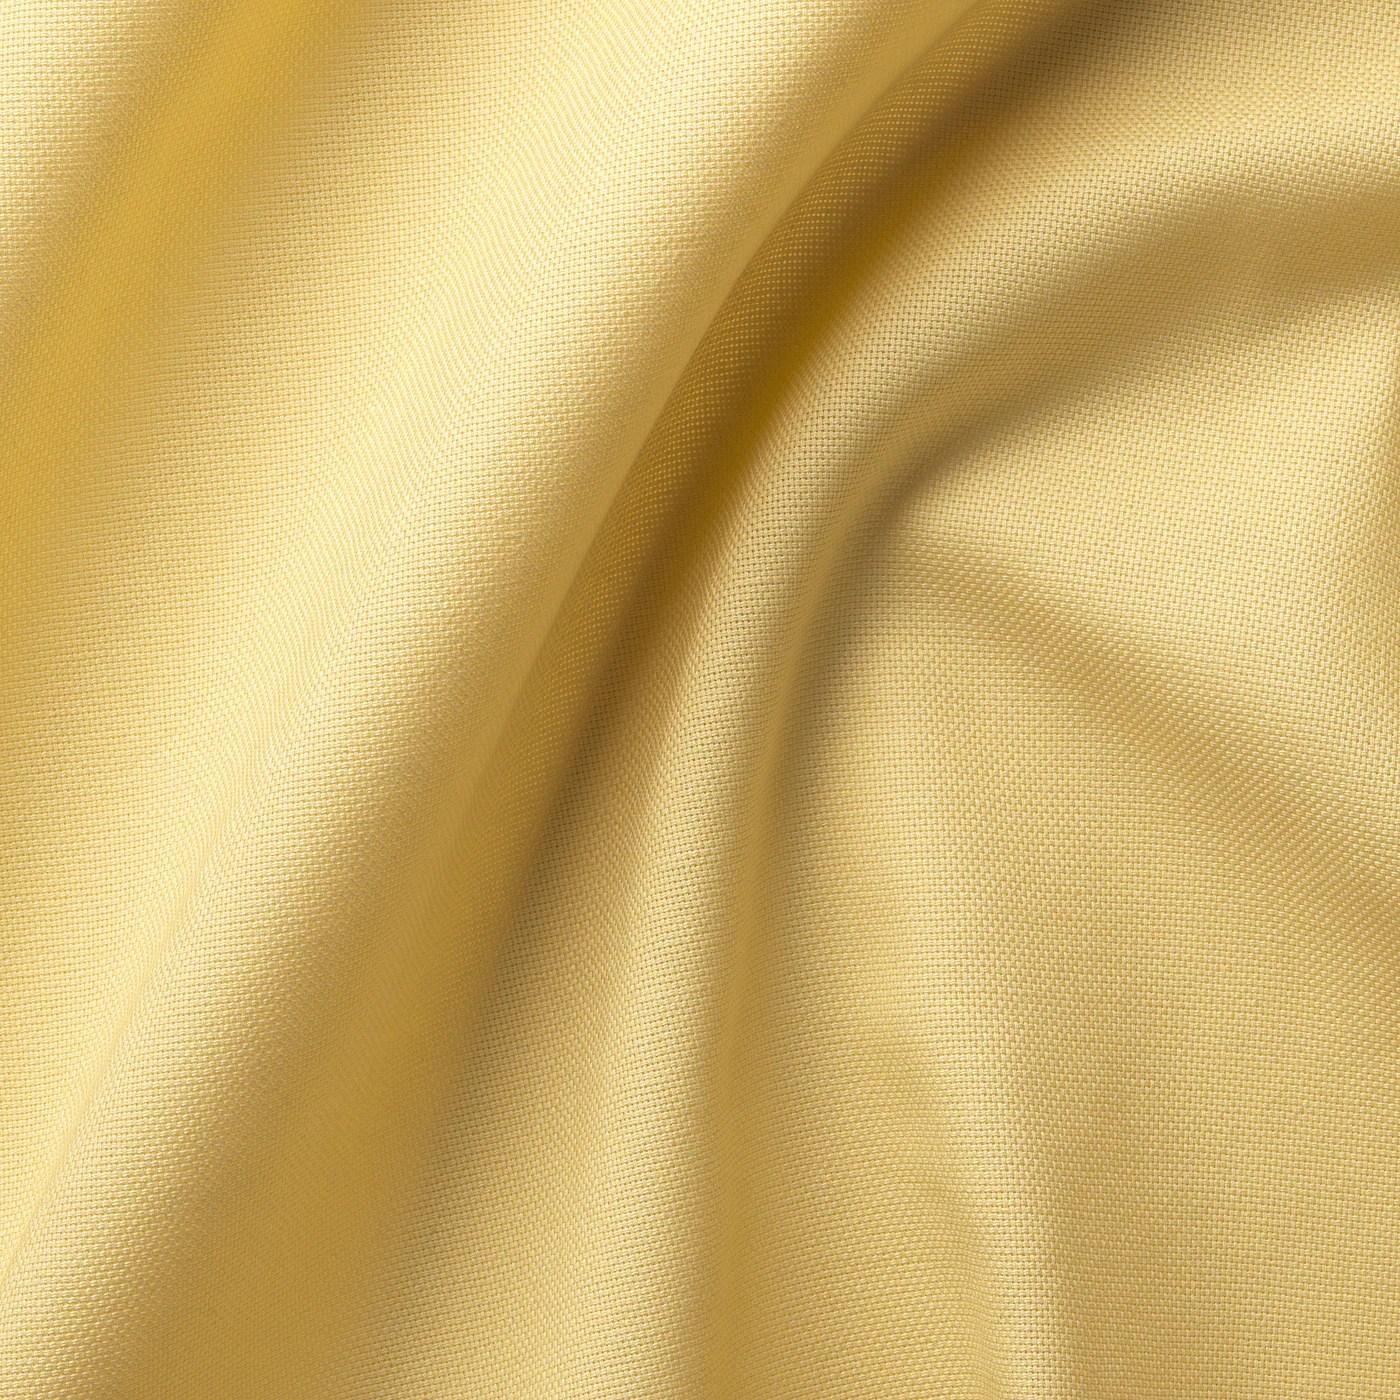 annalouisa rideaux 2 pieces jaune clair 145x300 cm